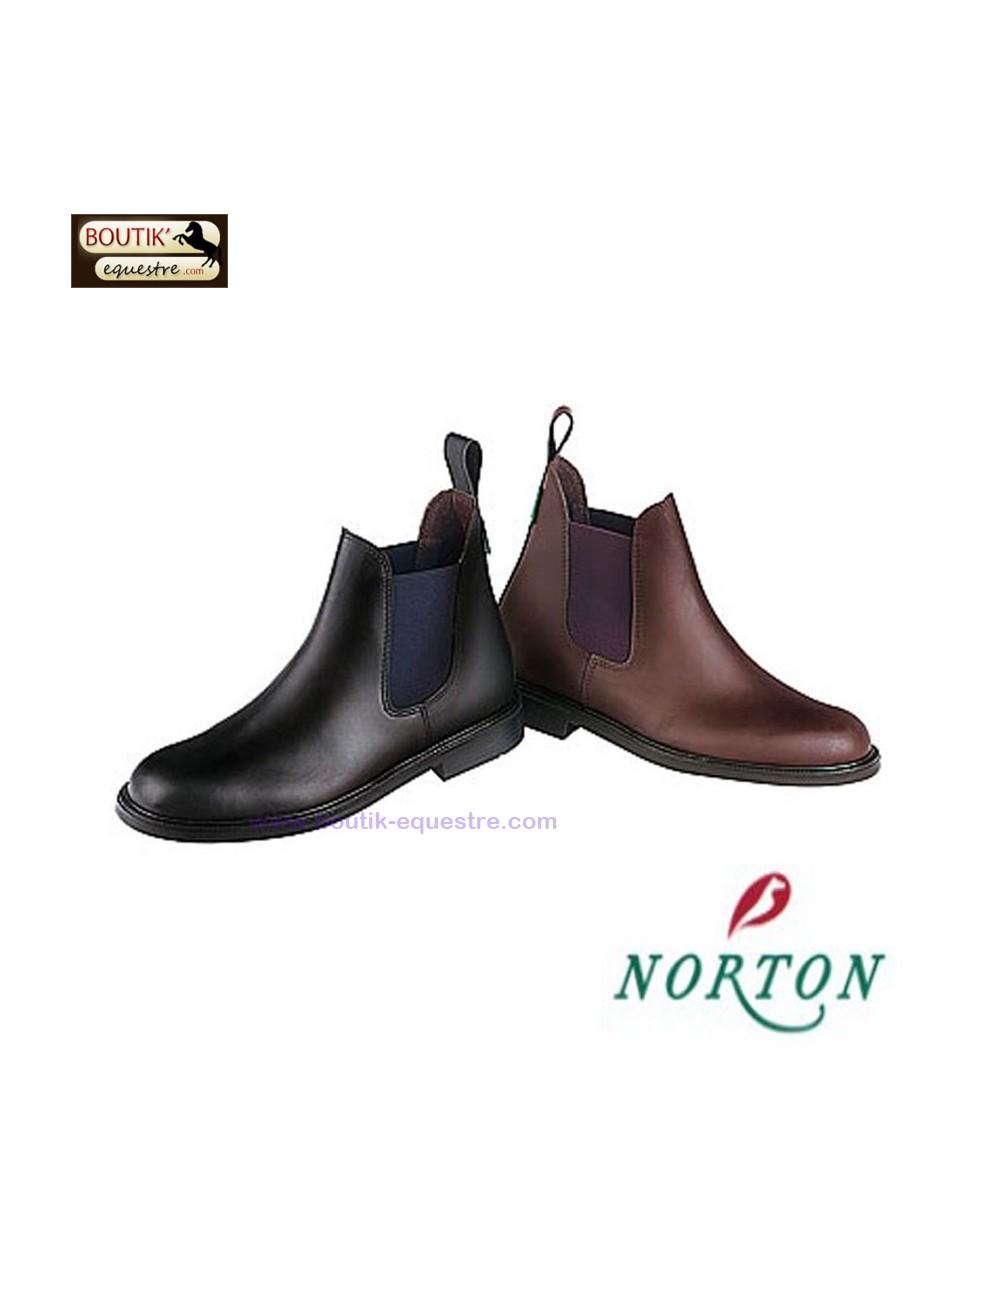 Boots NORTON Epson